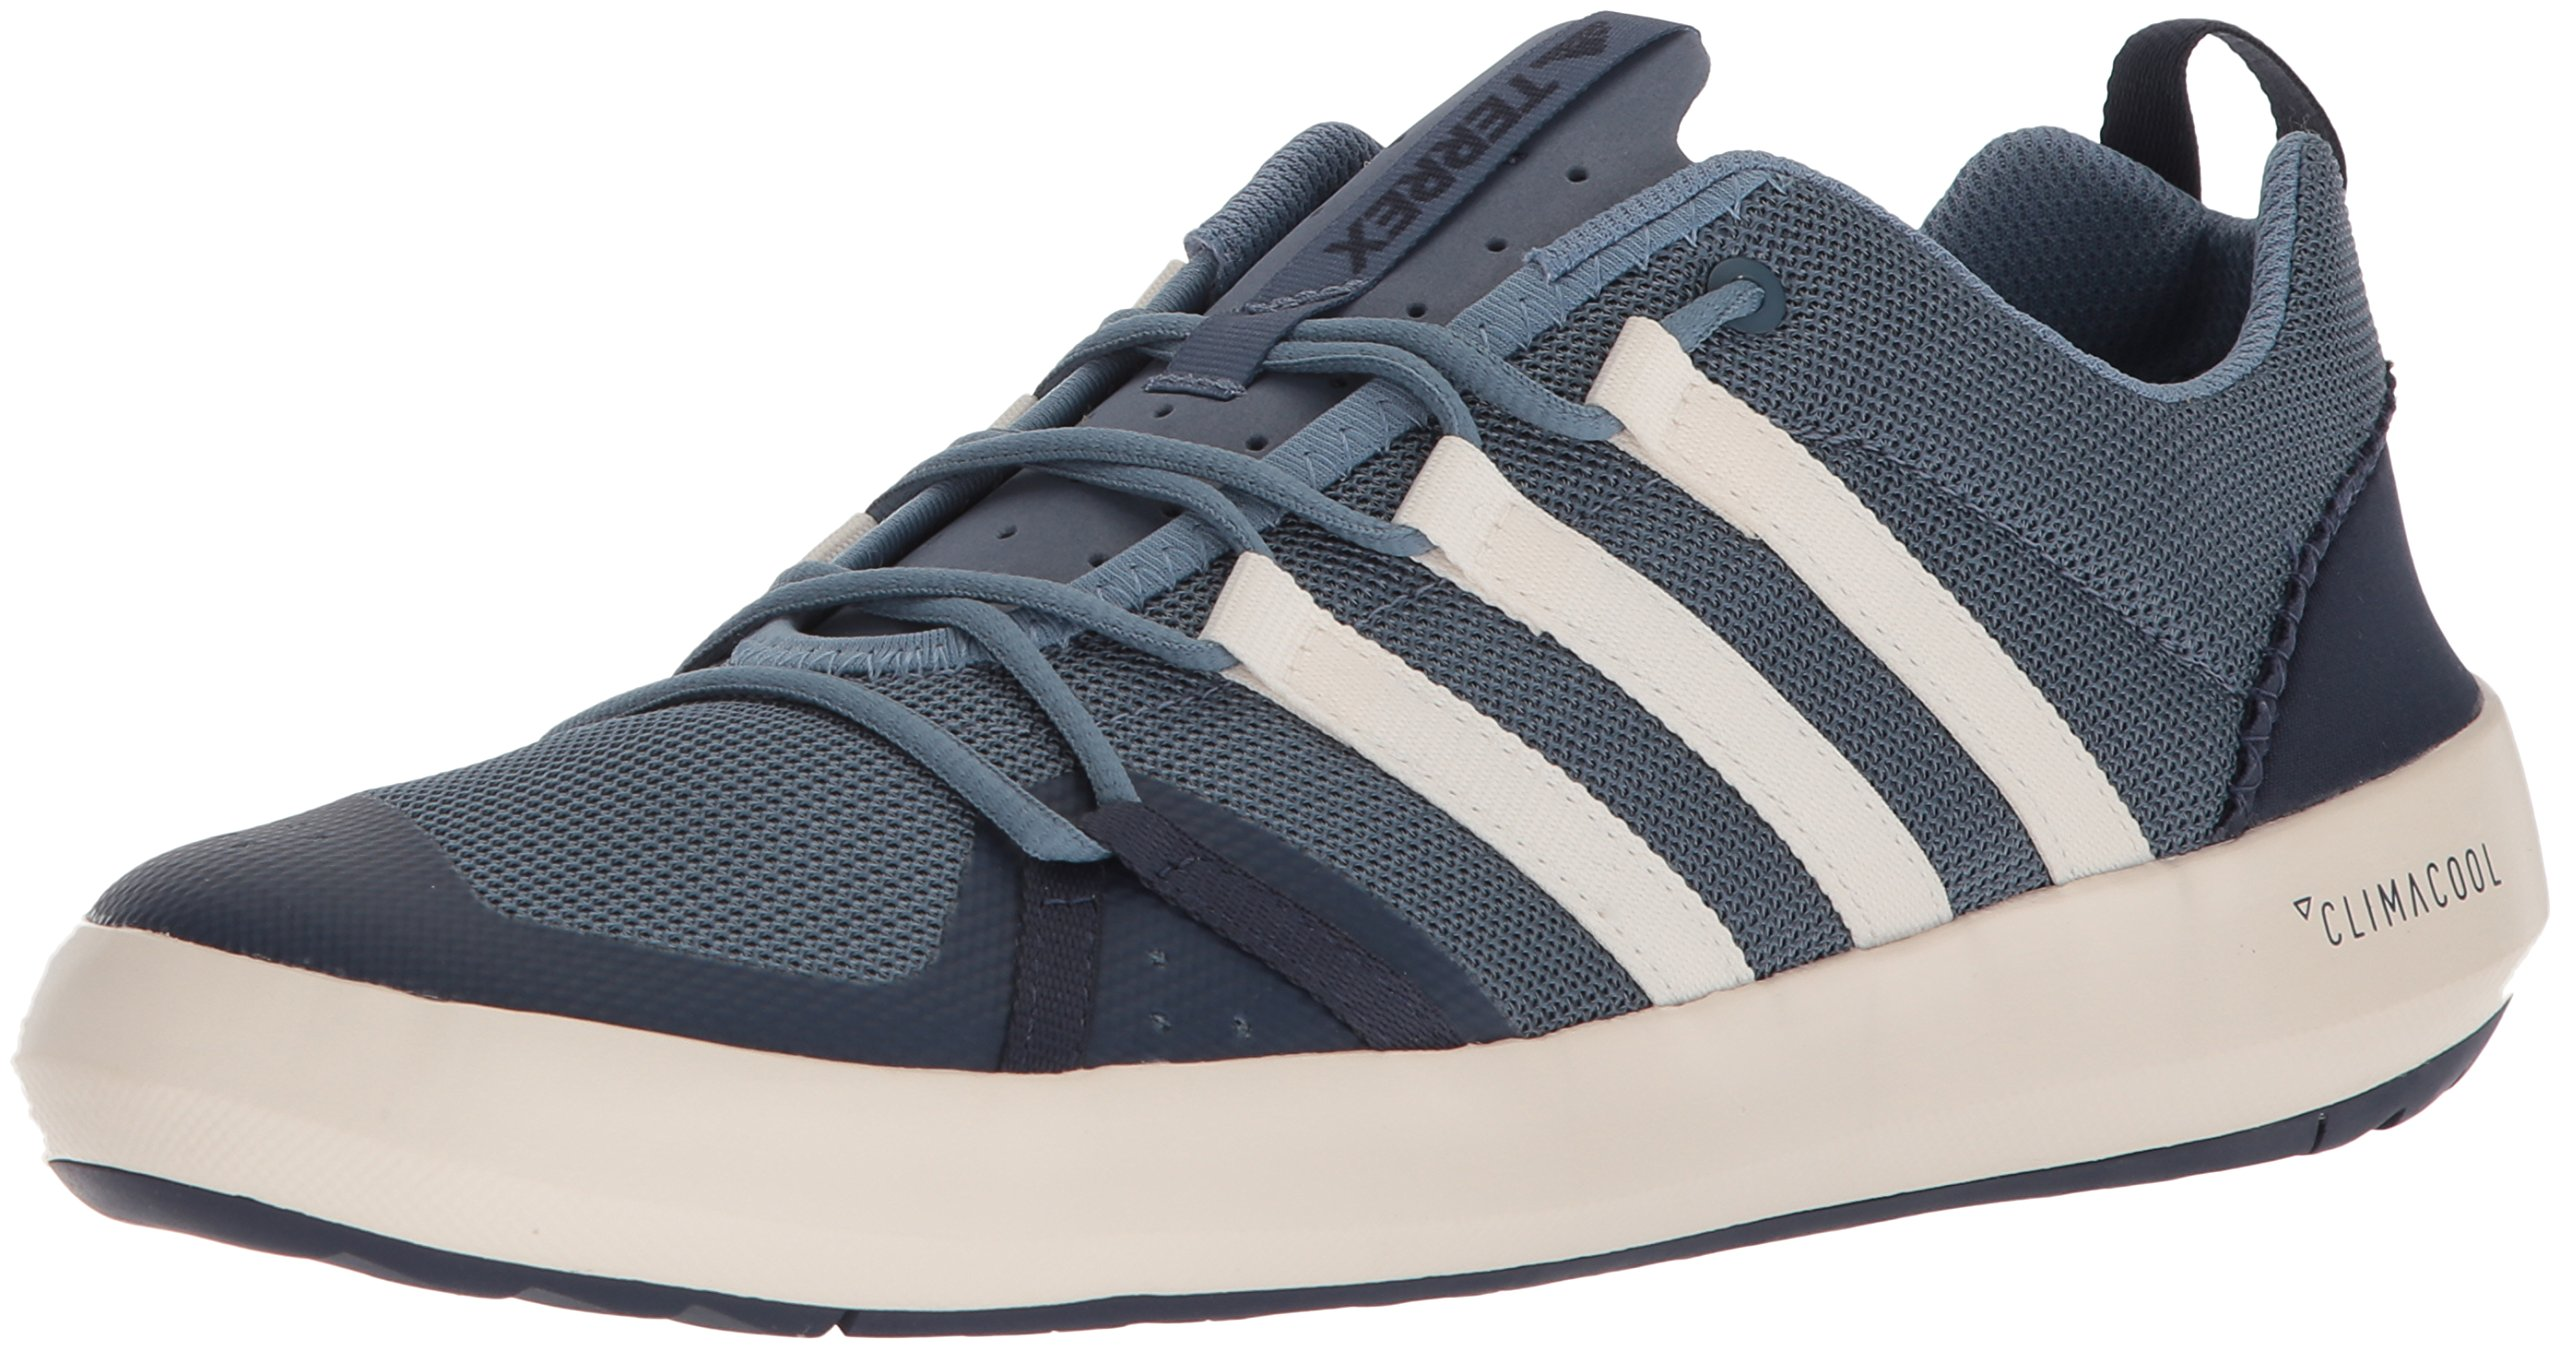 adidas outdoor Men's Terrex CC Boat Walking Shoe, Raw Grey/Chalk White/Ash Grey, 10.5 D US